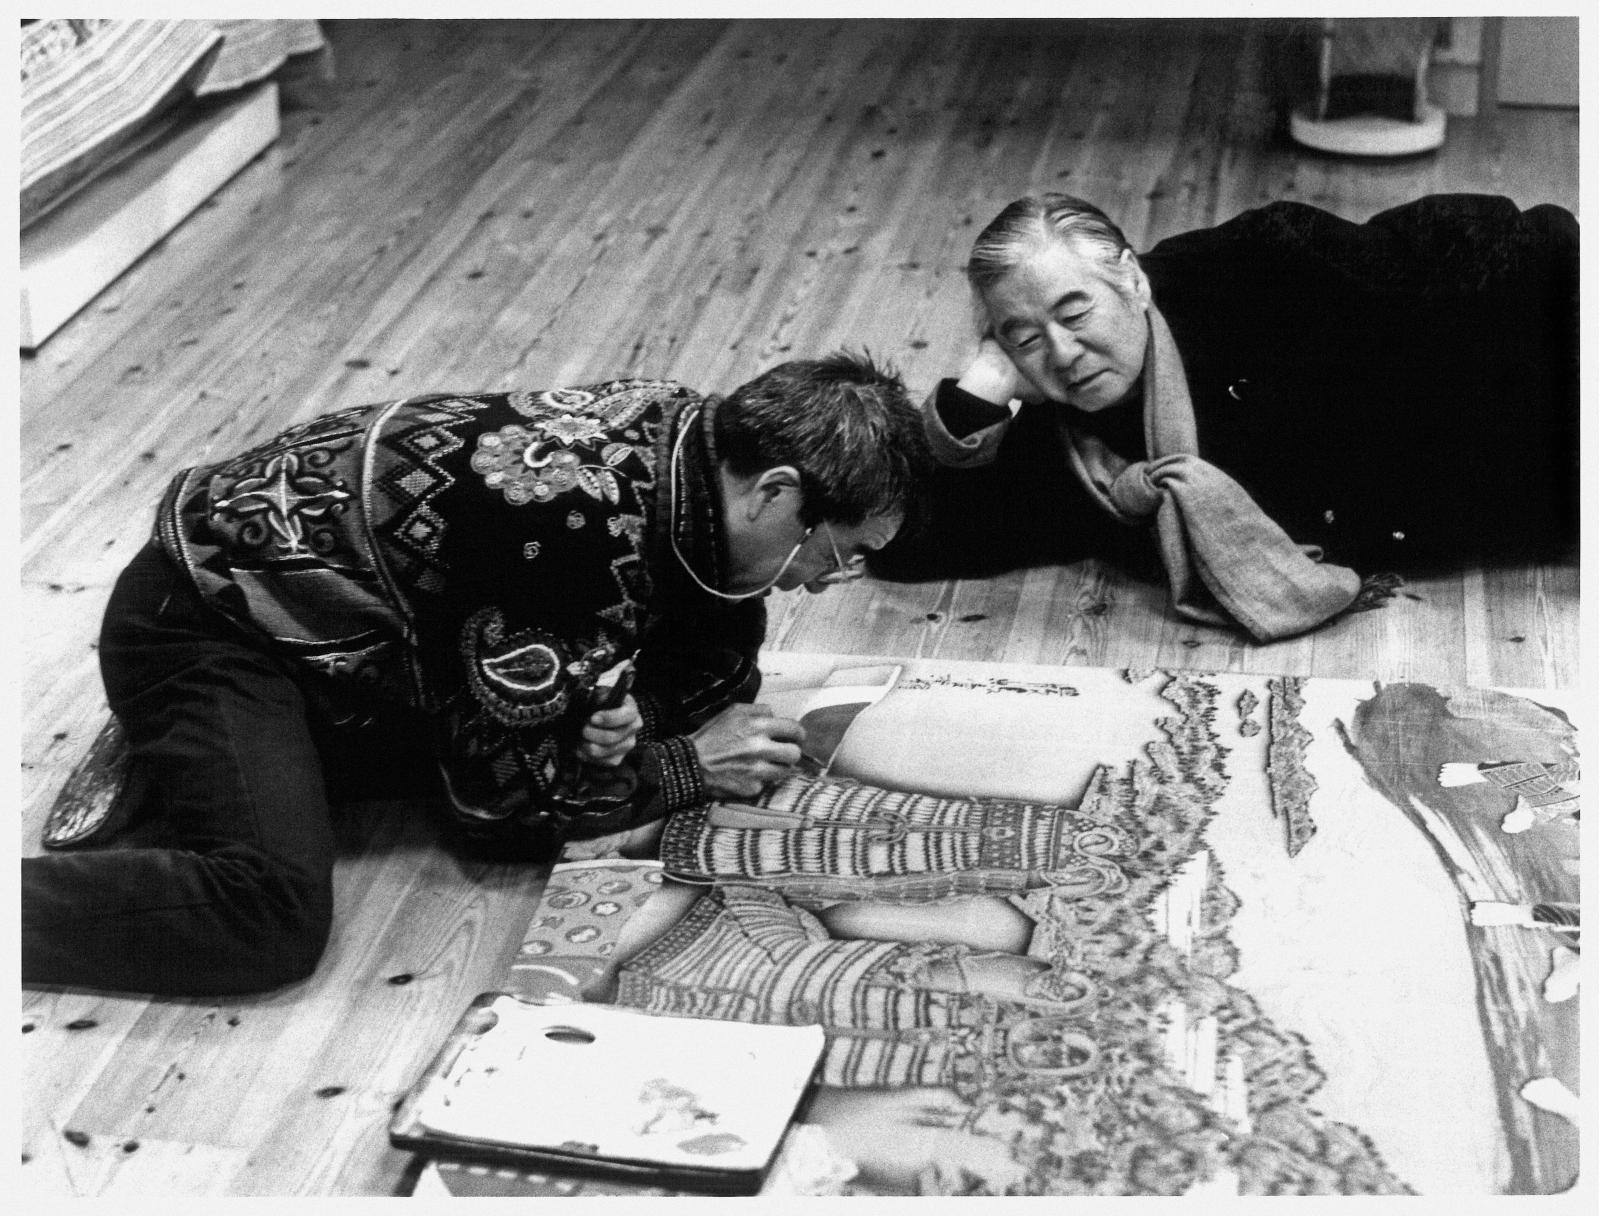 L'artiste Kyosuke Tchinaï et Kiyoshi Taménaga, à Saitama en 2002. Courtesy Galerie Taménaga